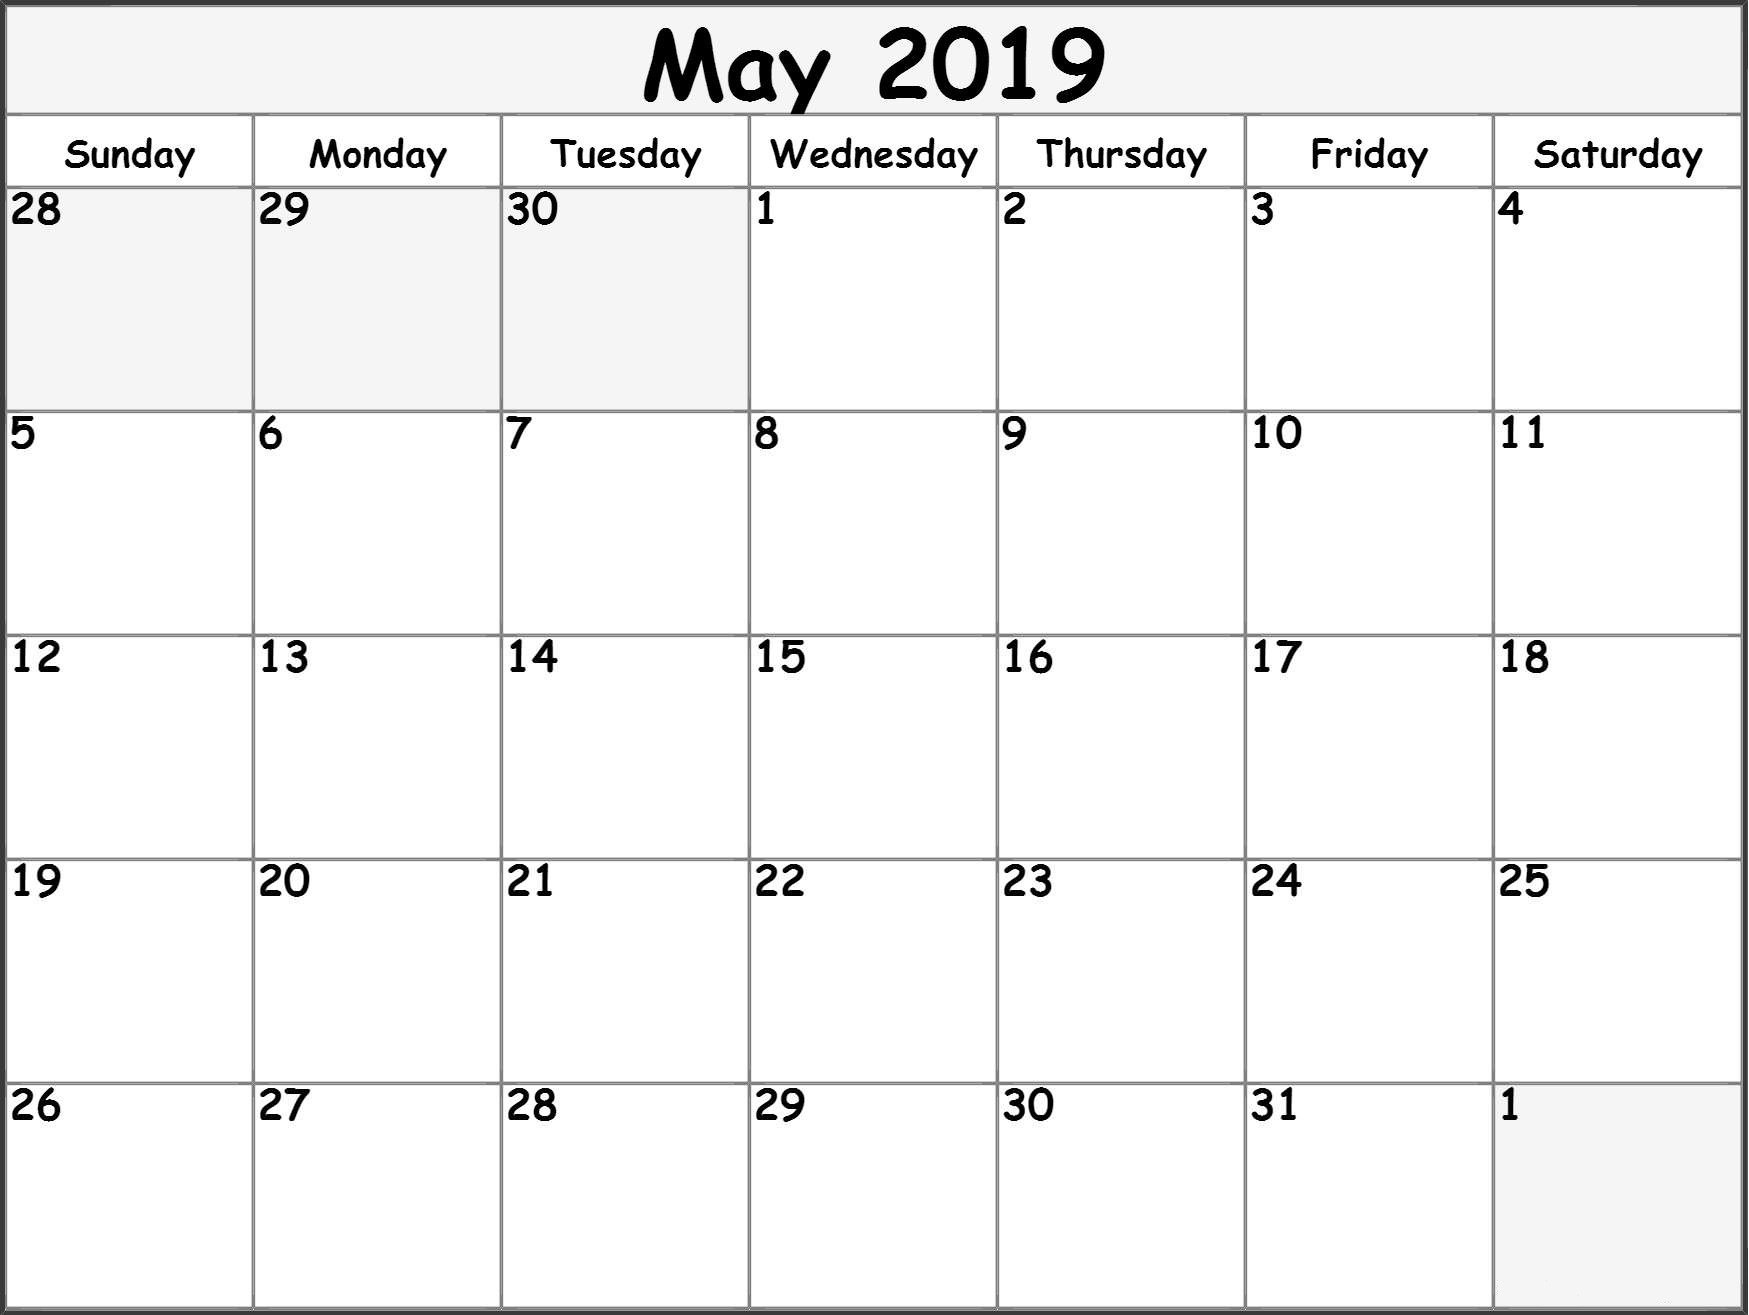 May 2019 Printable Calendar Templates - Free Blank, Pdf